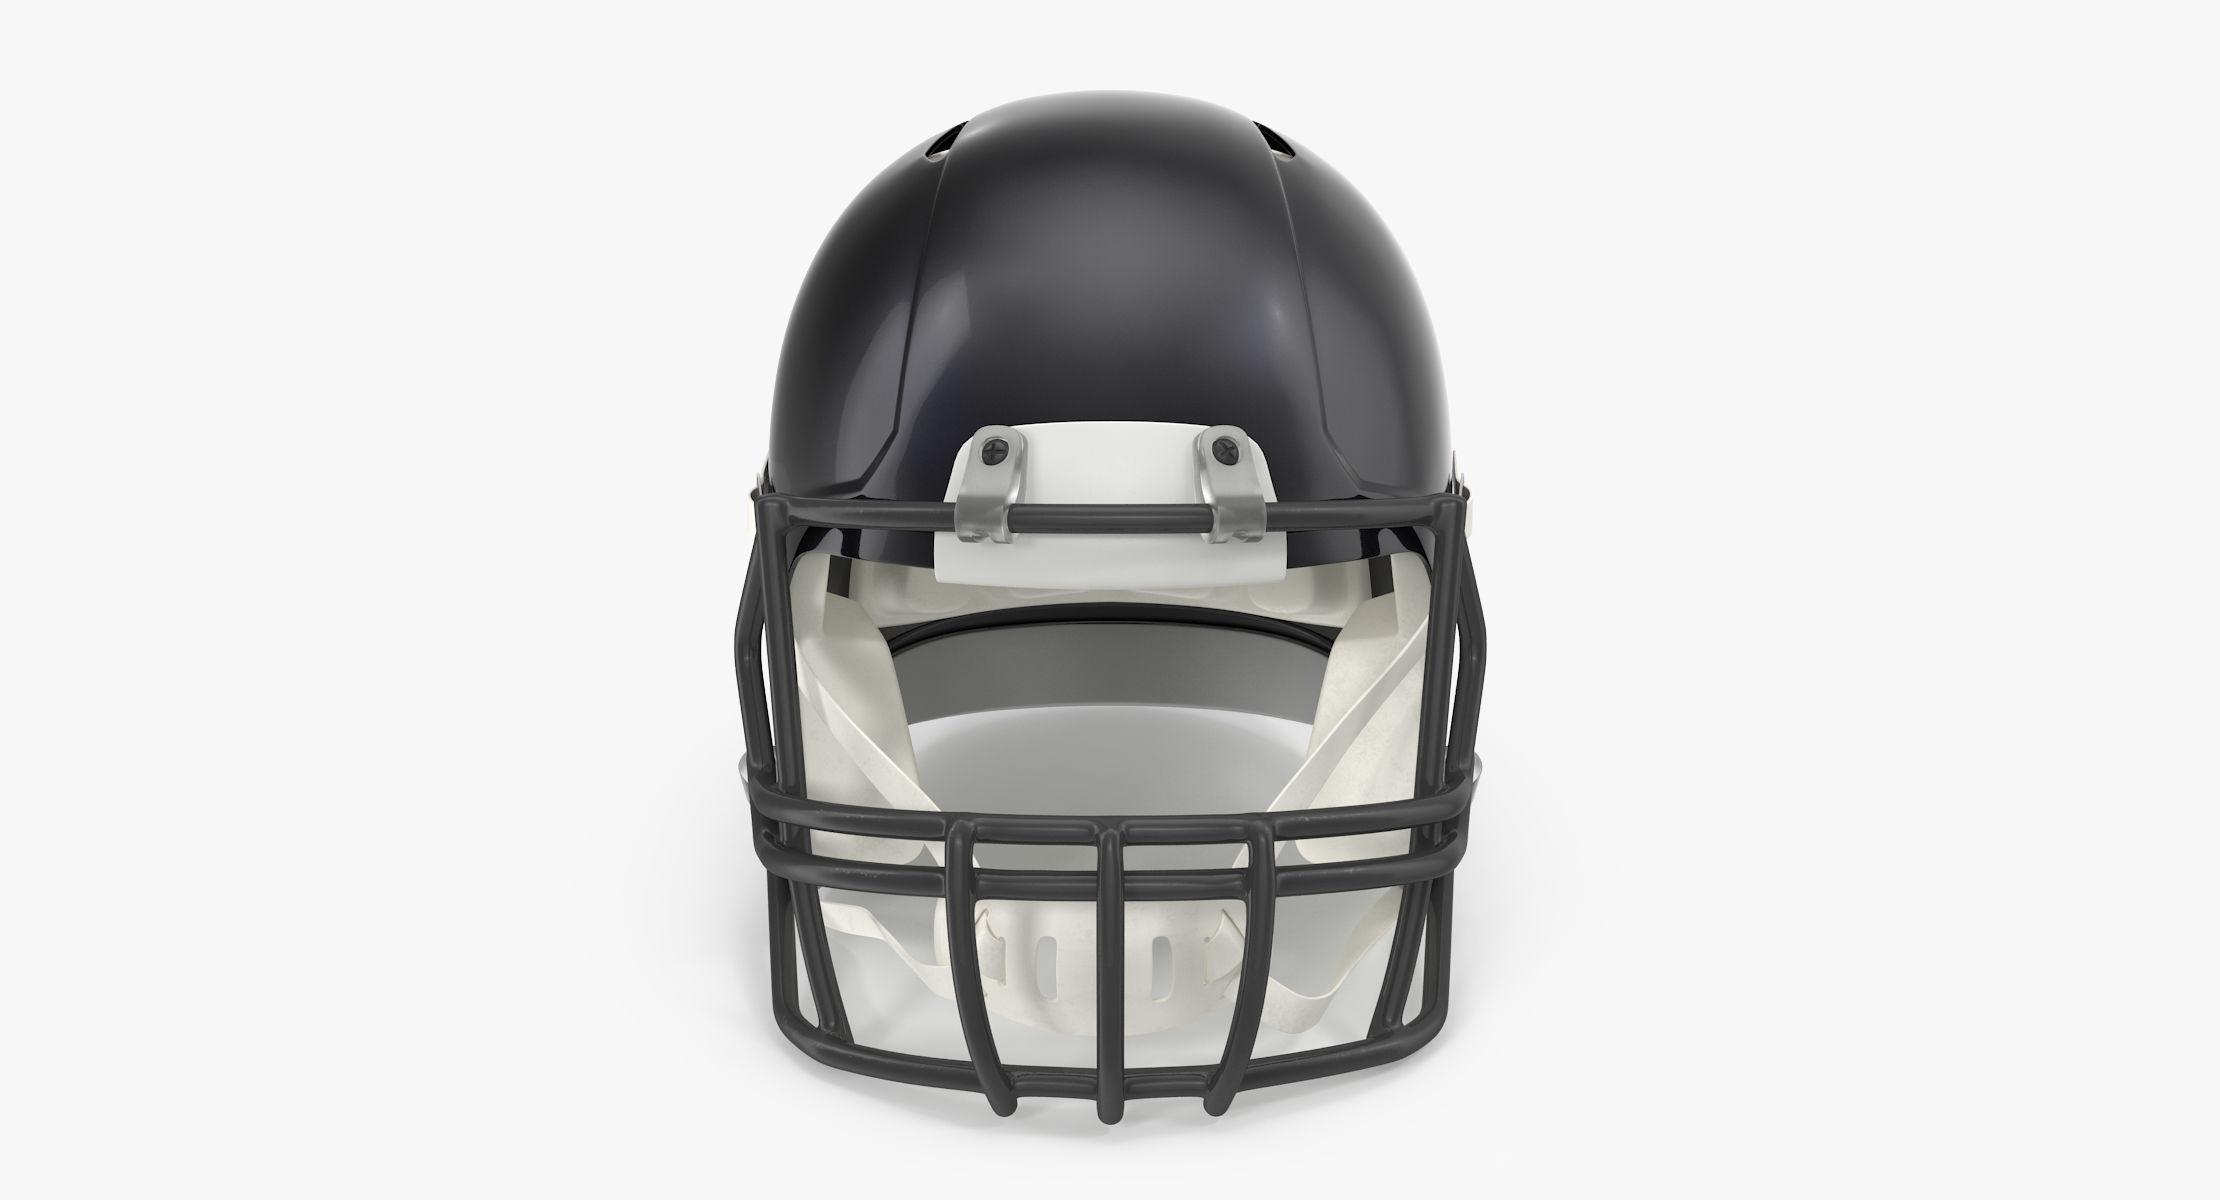 Football Helmet 02 - reel 1